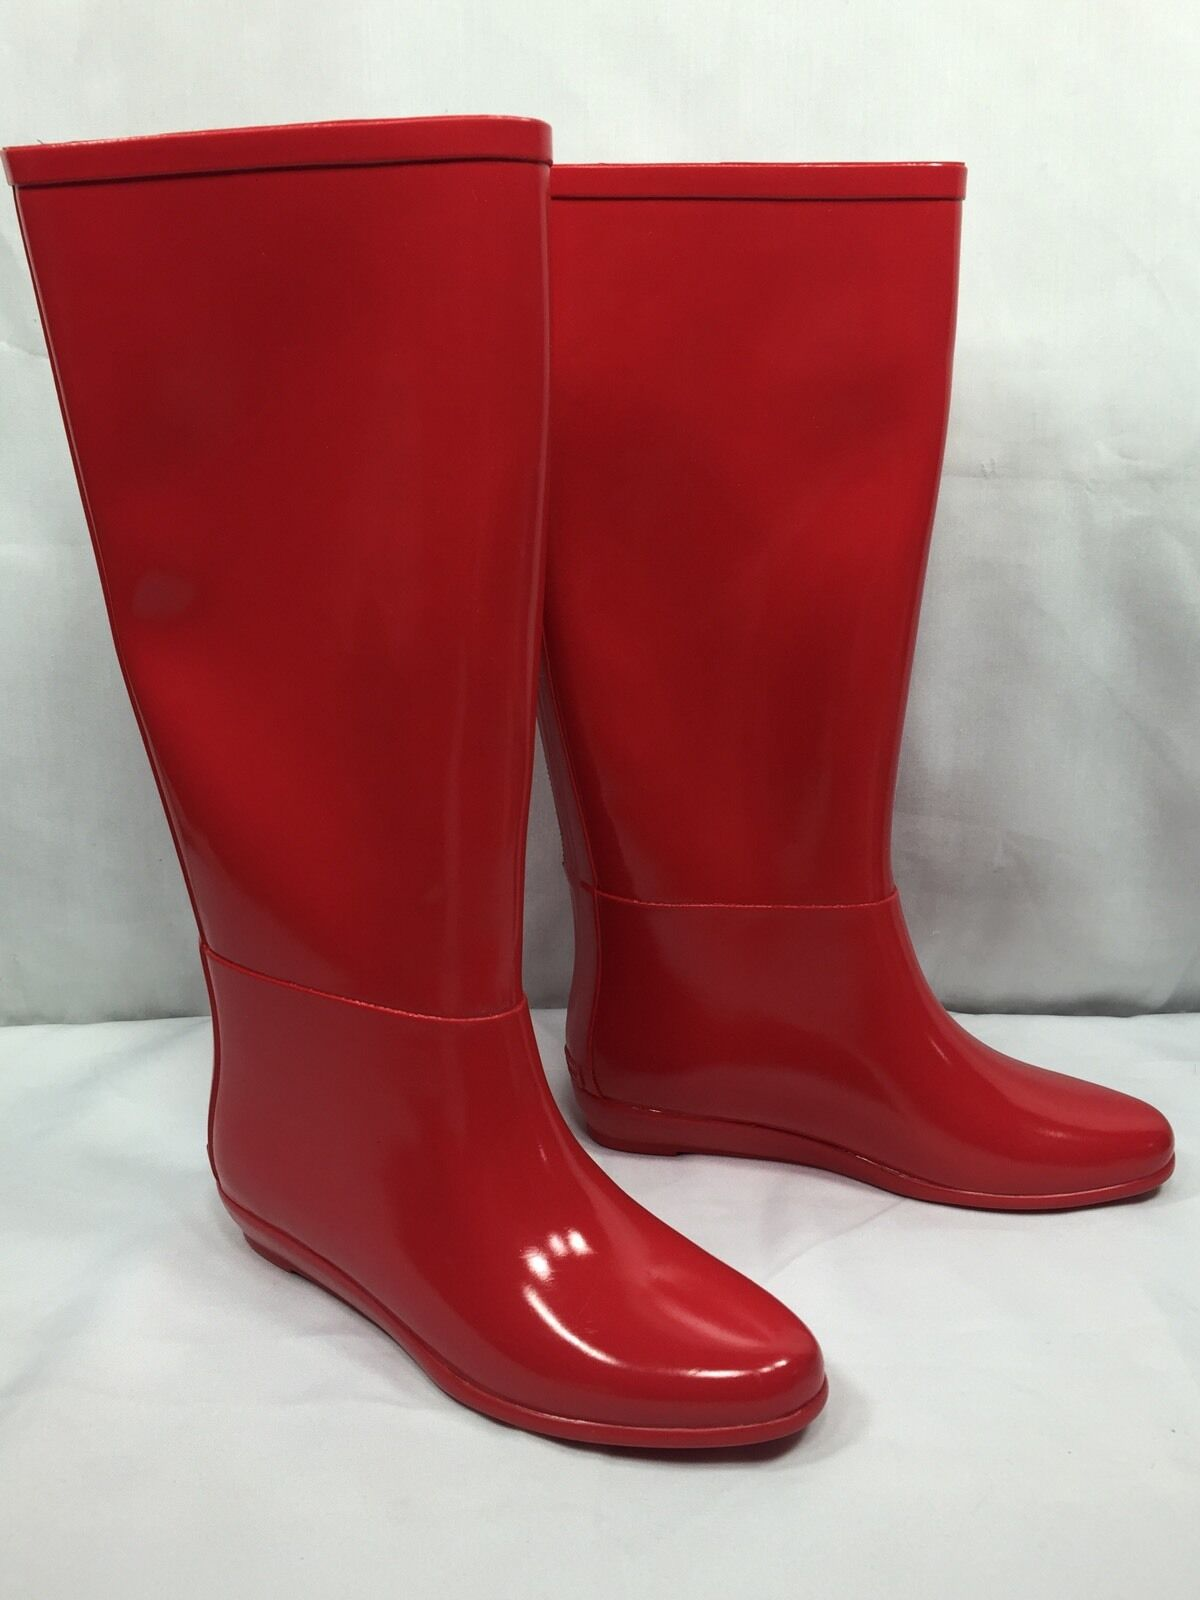 NEW NEW NEW  200 Loeffler Randall Tall Back Zip Shiny Red Rain Boots Wellies Womens Sz 6 97c877